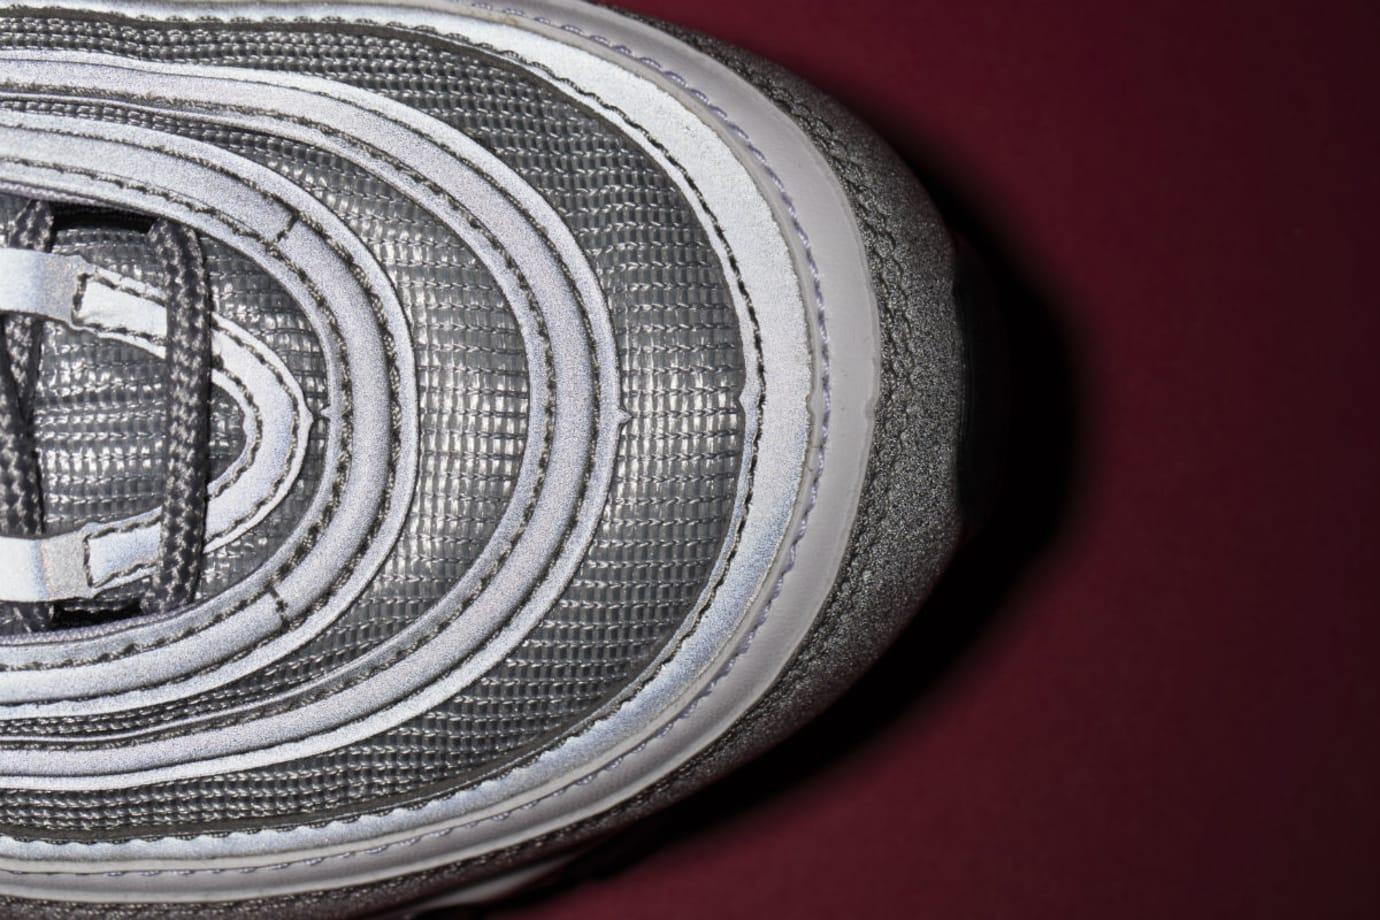 Nike Air Max 97 Silver Bullet 2017 Release Date Top 884421-001